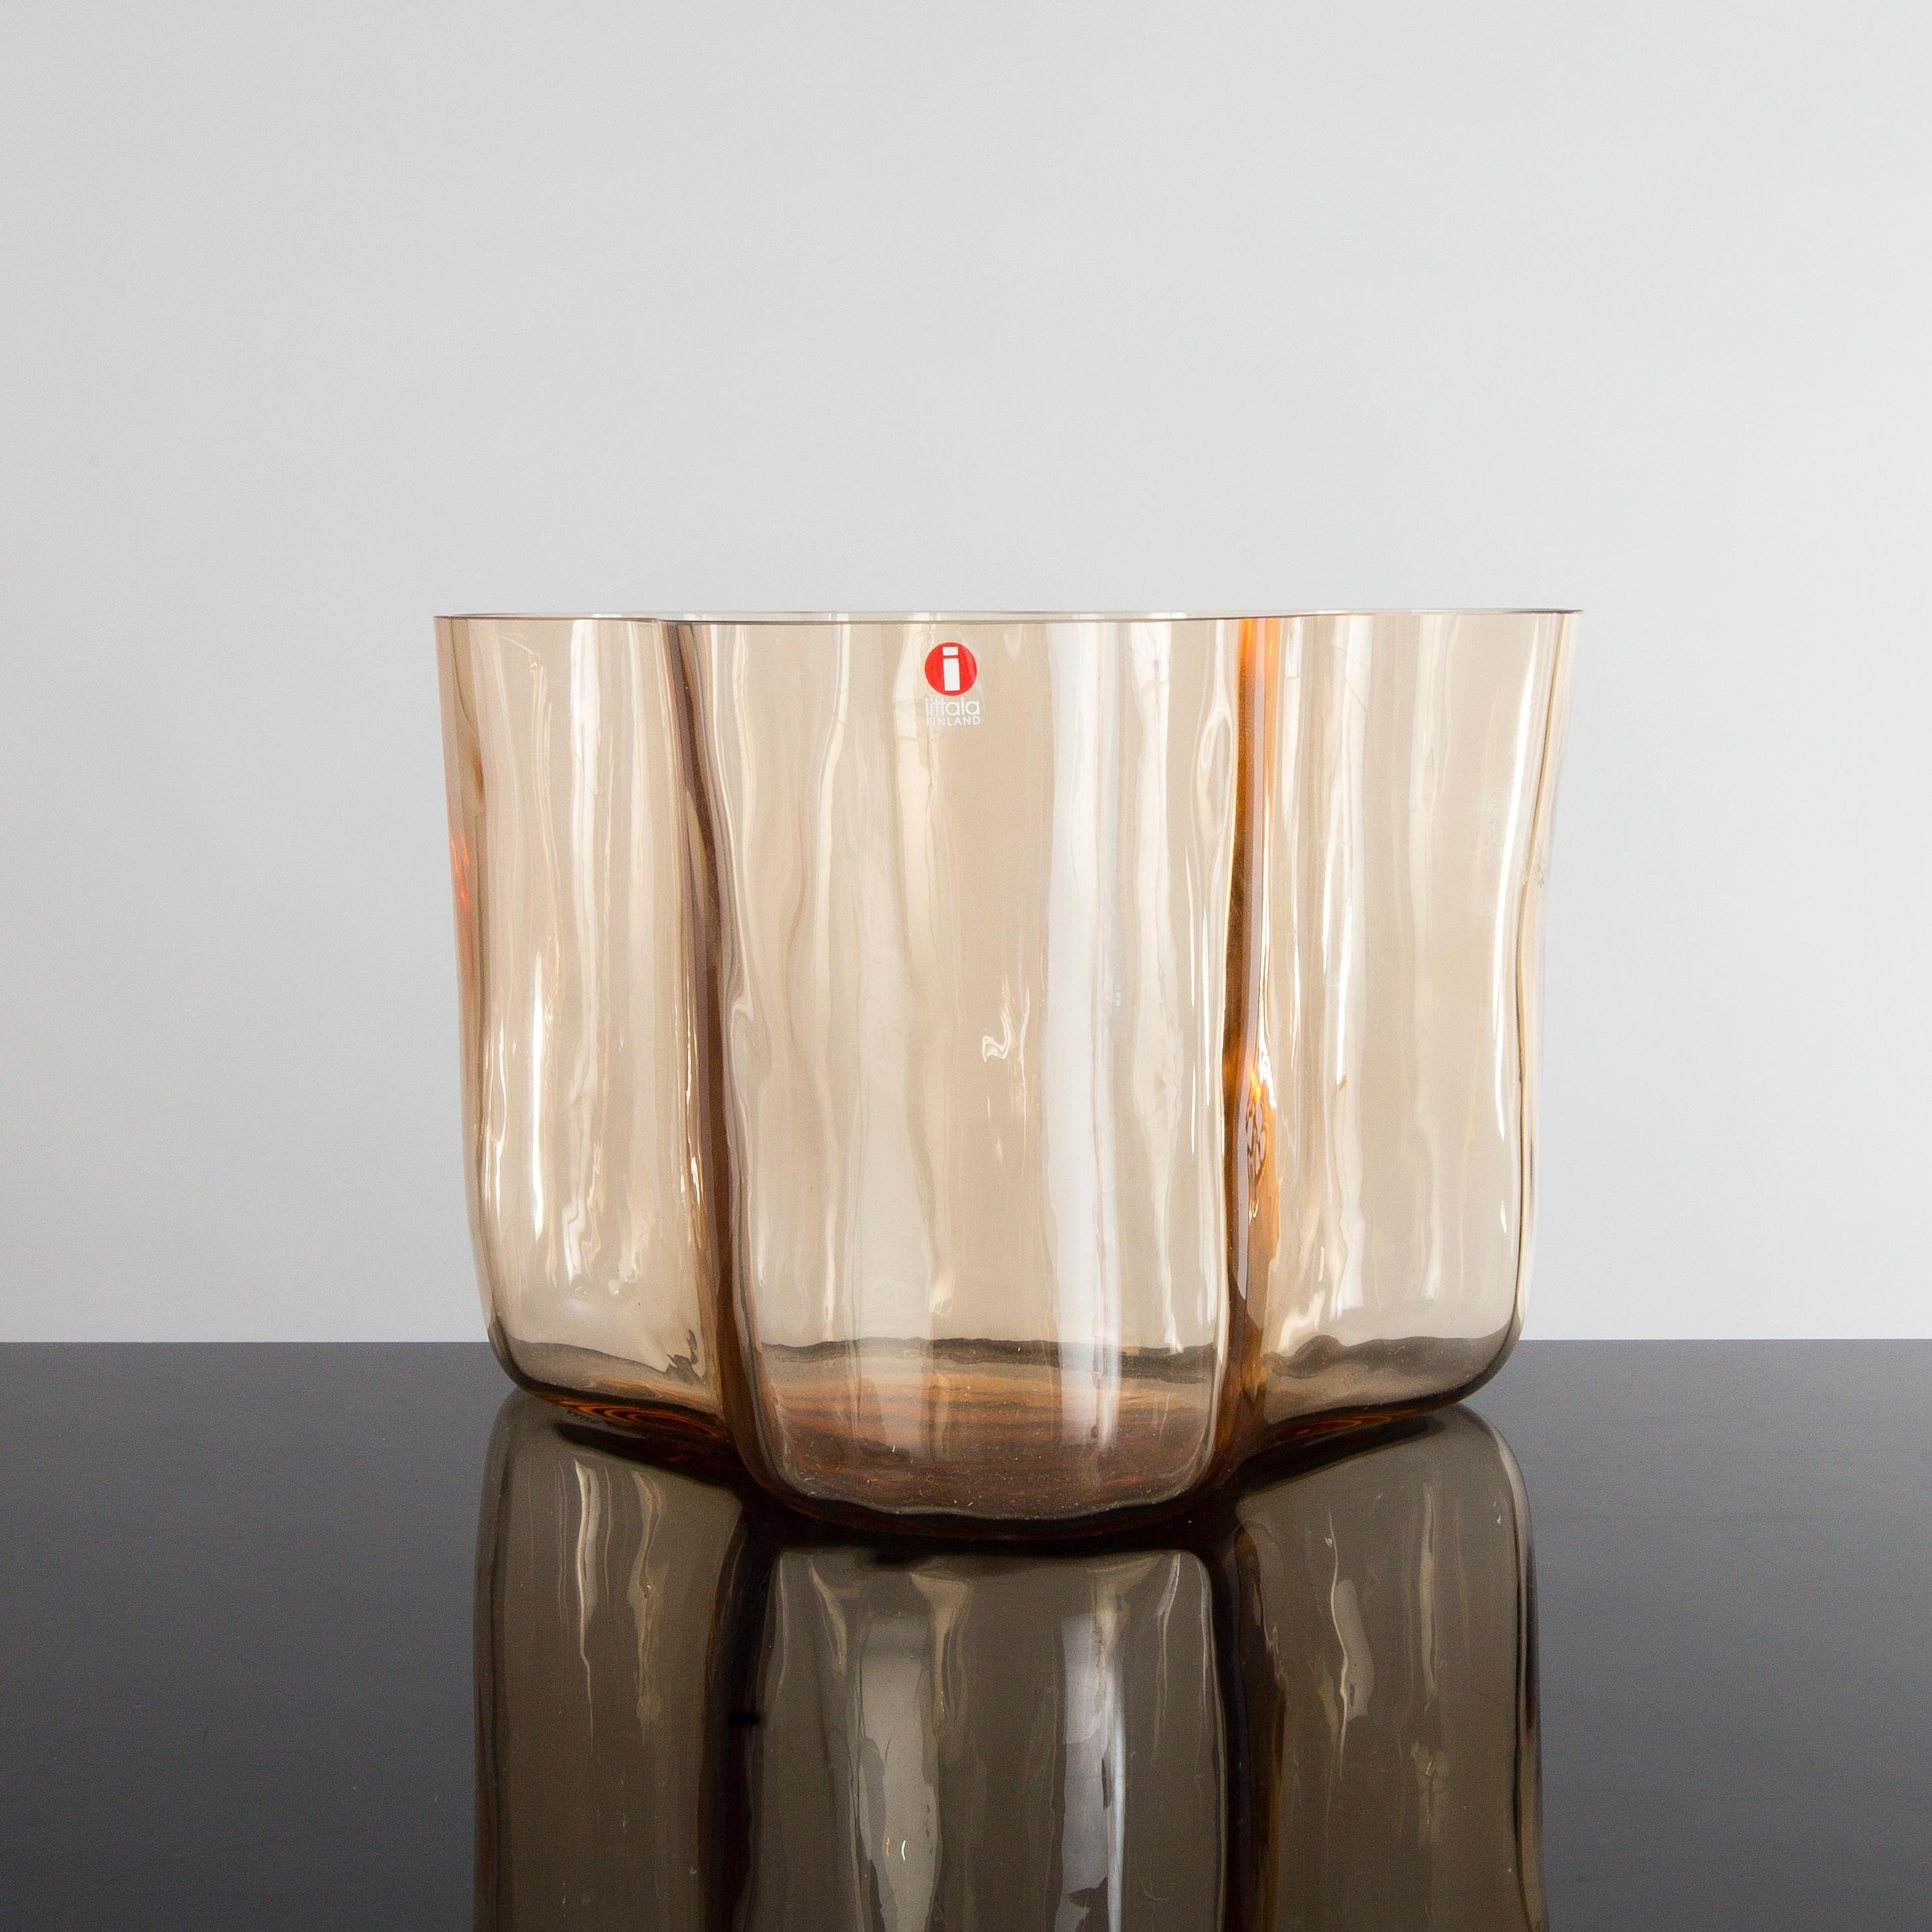 Alvar aalto an amber glass vase savoy 3030 by alvar aalto for 9952077 bukobject reviewsmspy